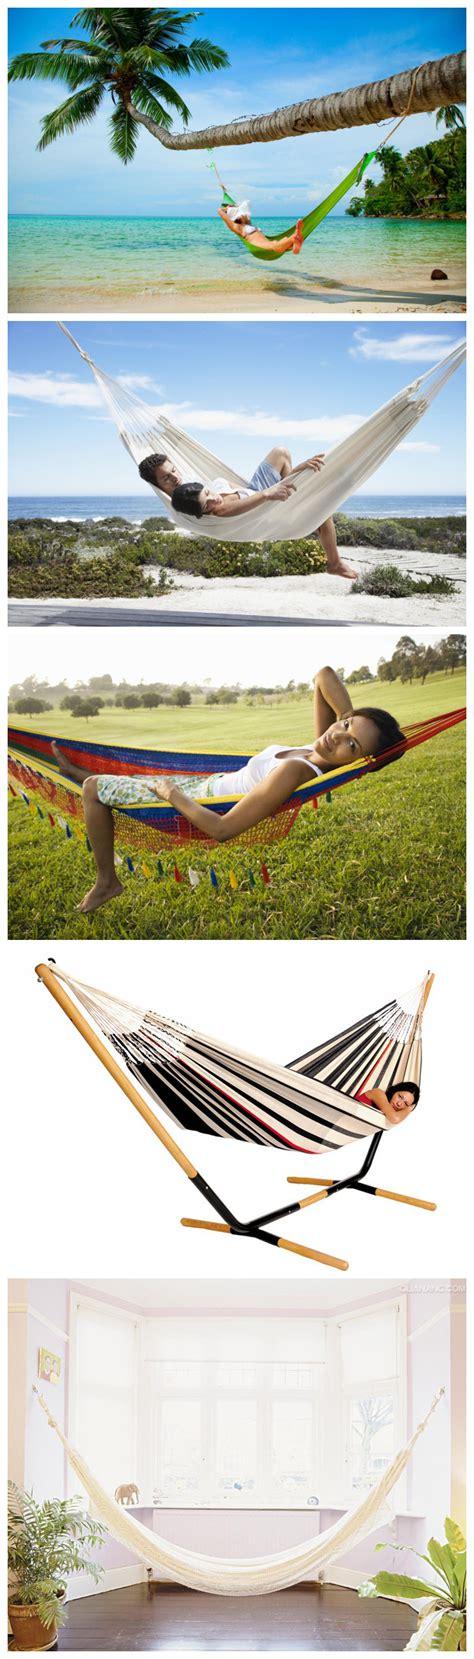 Parachute Hammock Commoc Hammocks Xxxl Size hc hm009 bi color parachute hammock outdoor portable